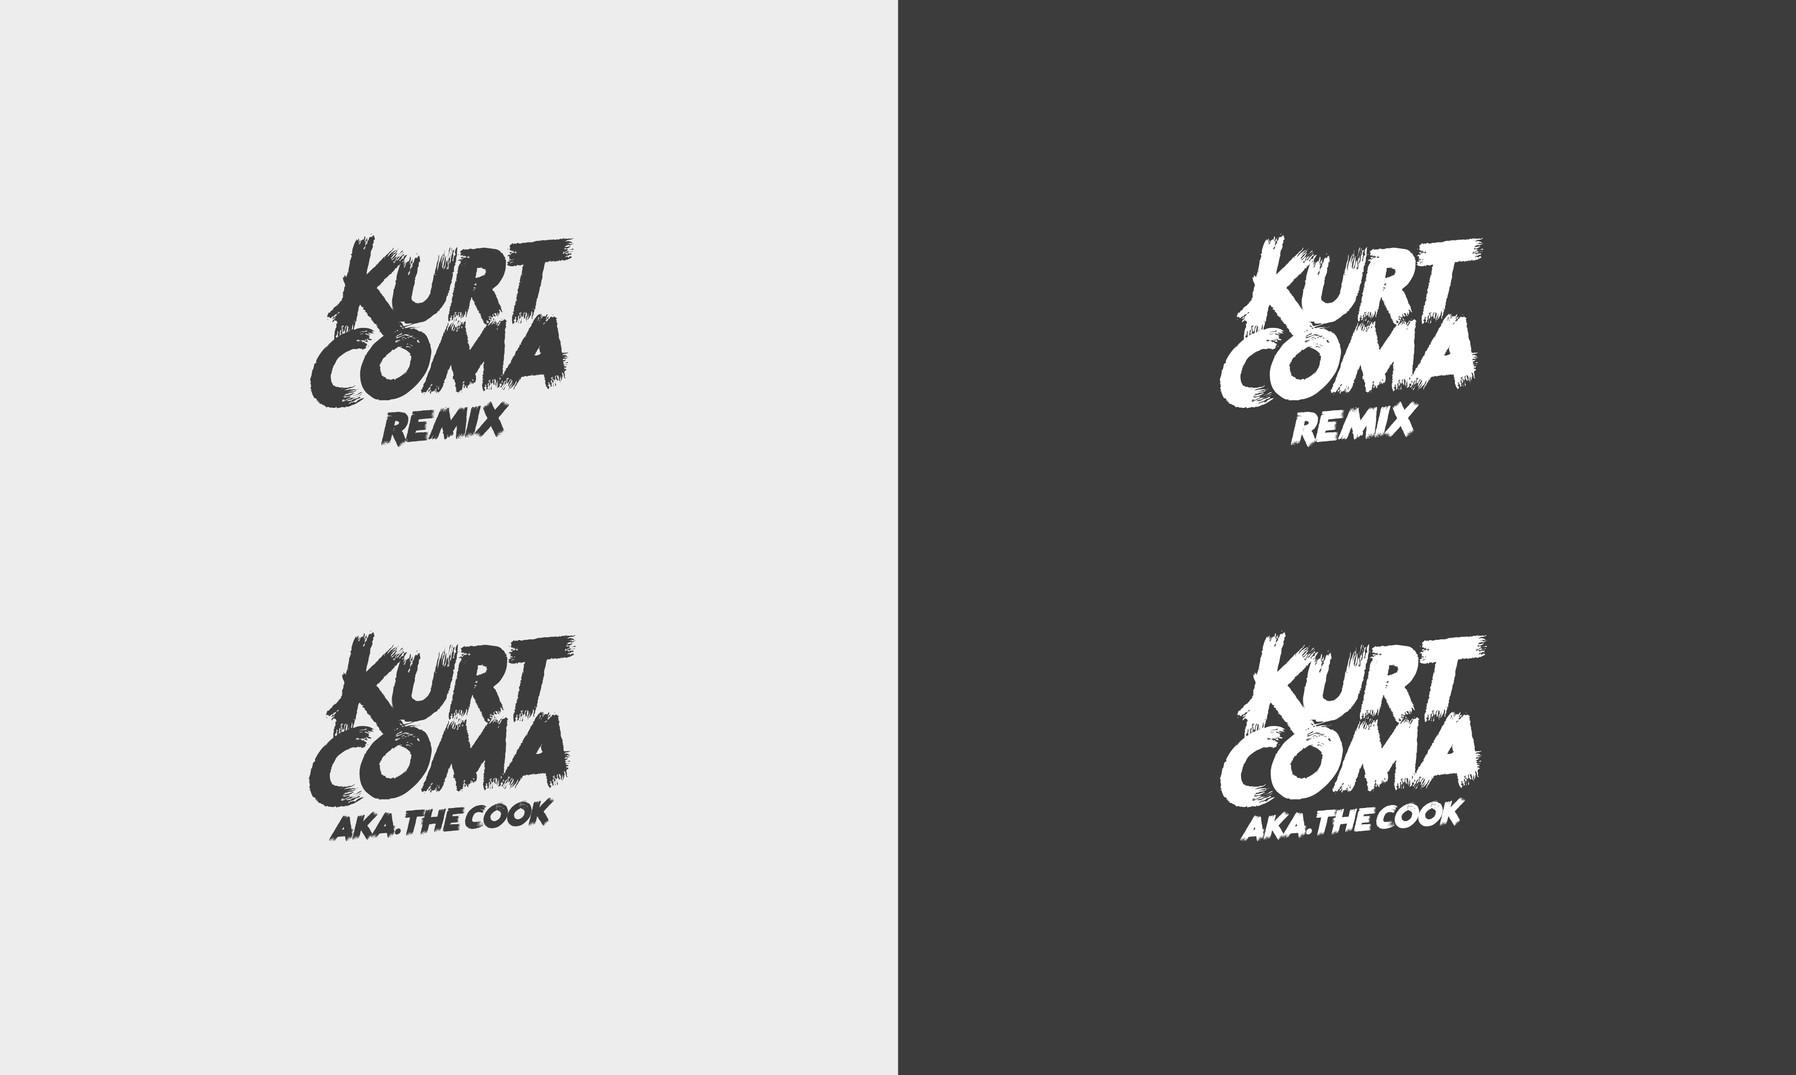 kurtcoma_logos_Zeichenfläche_1.jpg